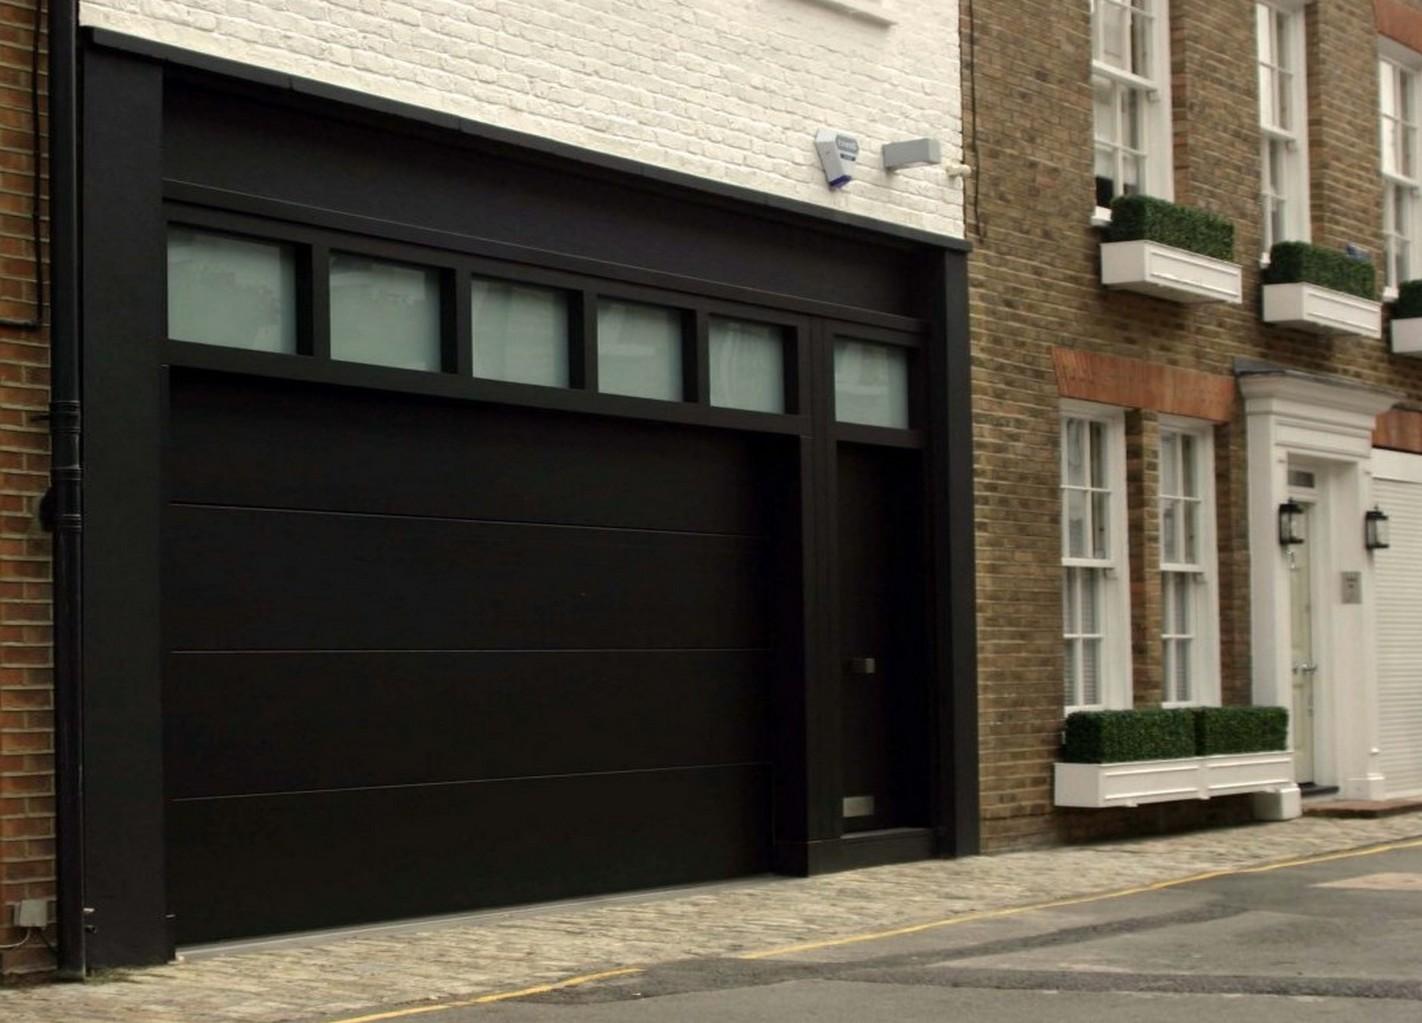 Modern Garage Door Ideas - FELISH HOME PROJECT on Garage Door Ideas  id=66522